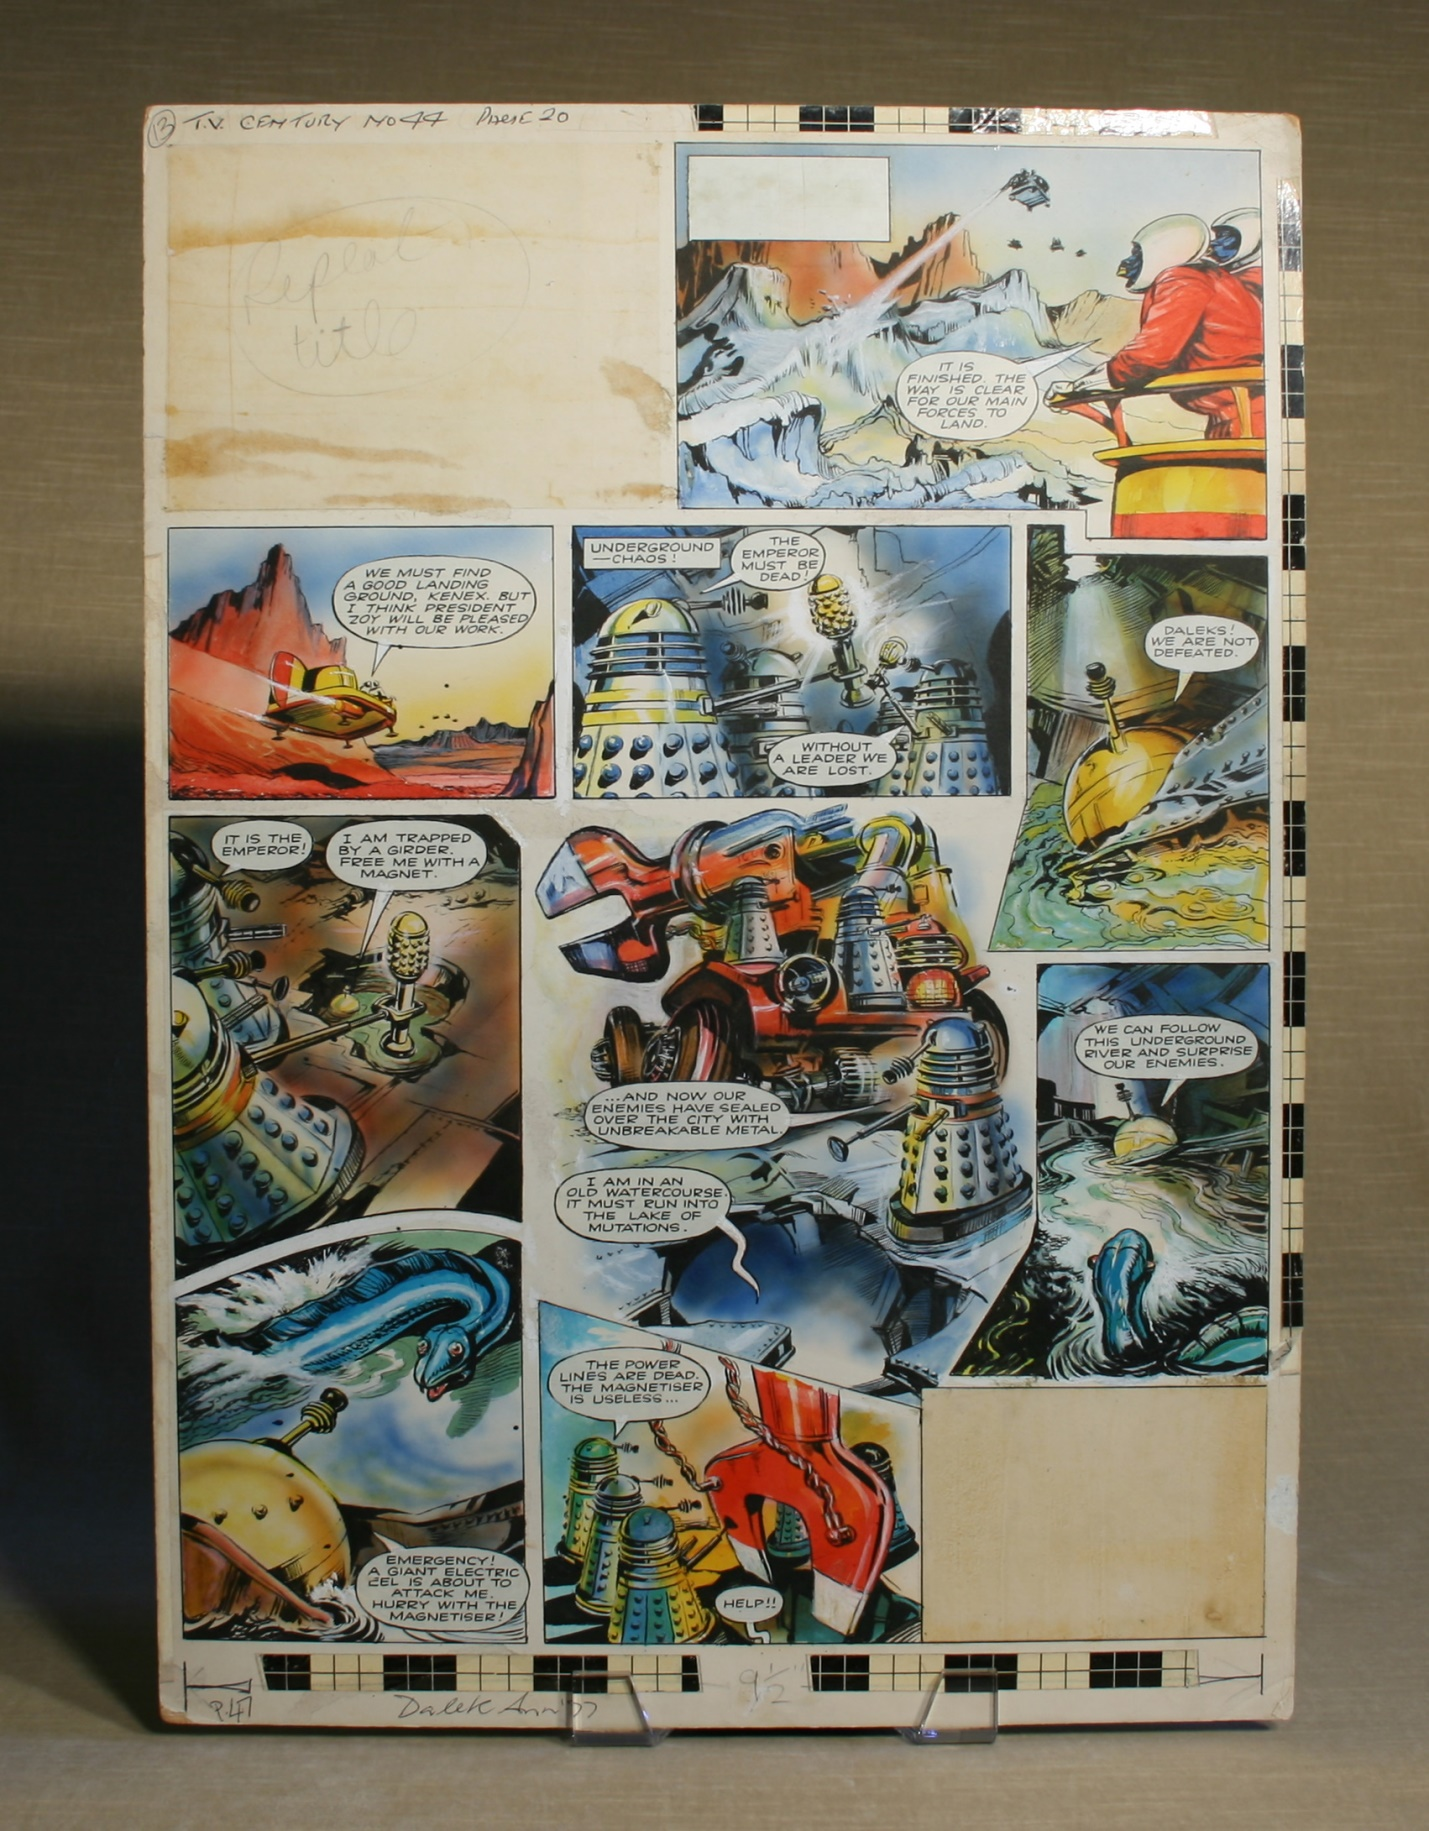 Original Dalek strip artwork, TV Century 21 #44